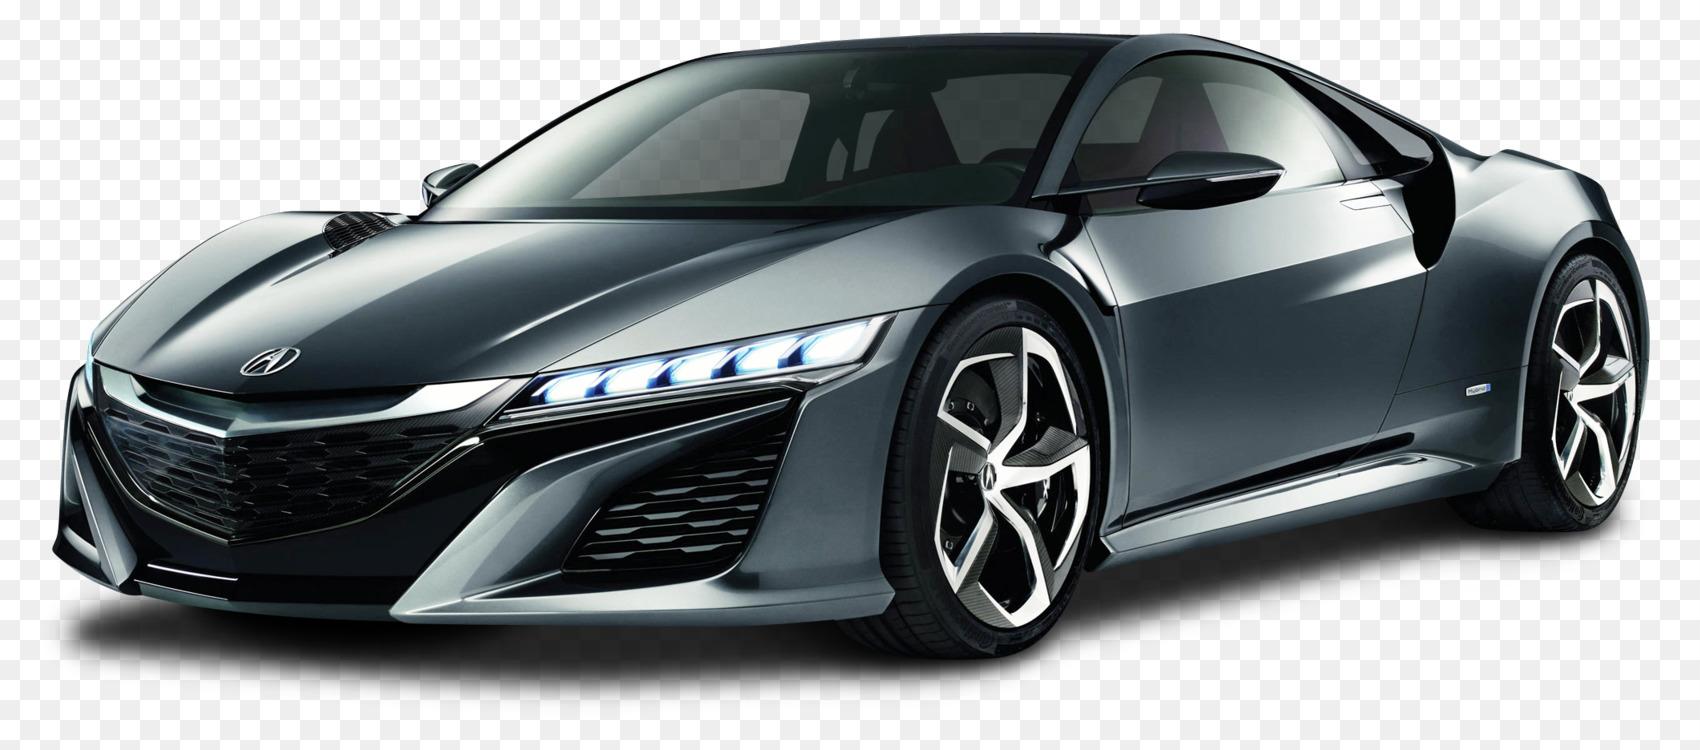 2018 Acura Nsx Car Honda Motor Company Acura Legend Cc0 Rim